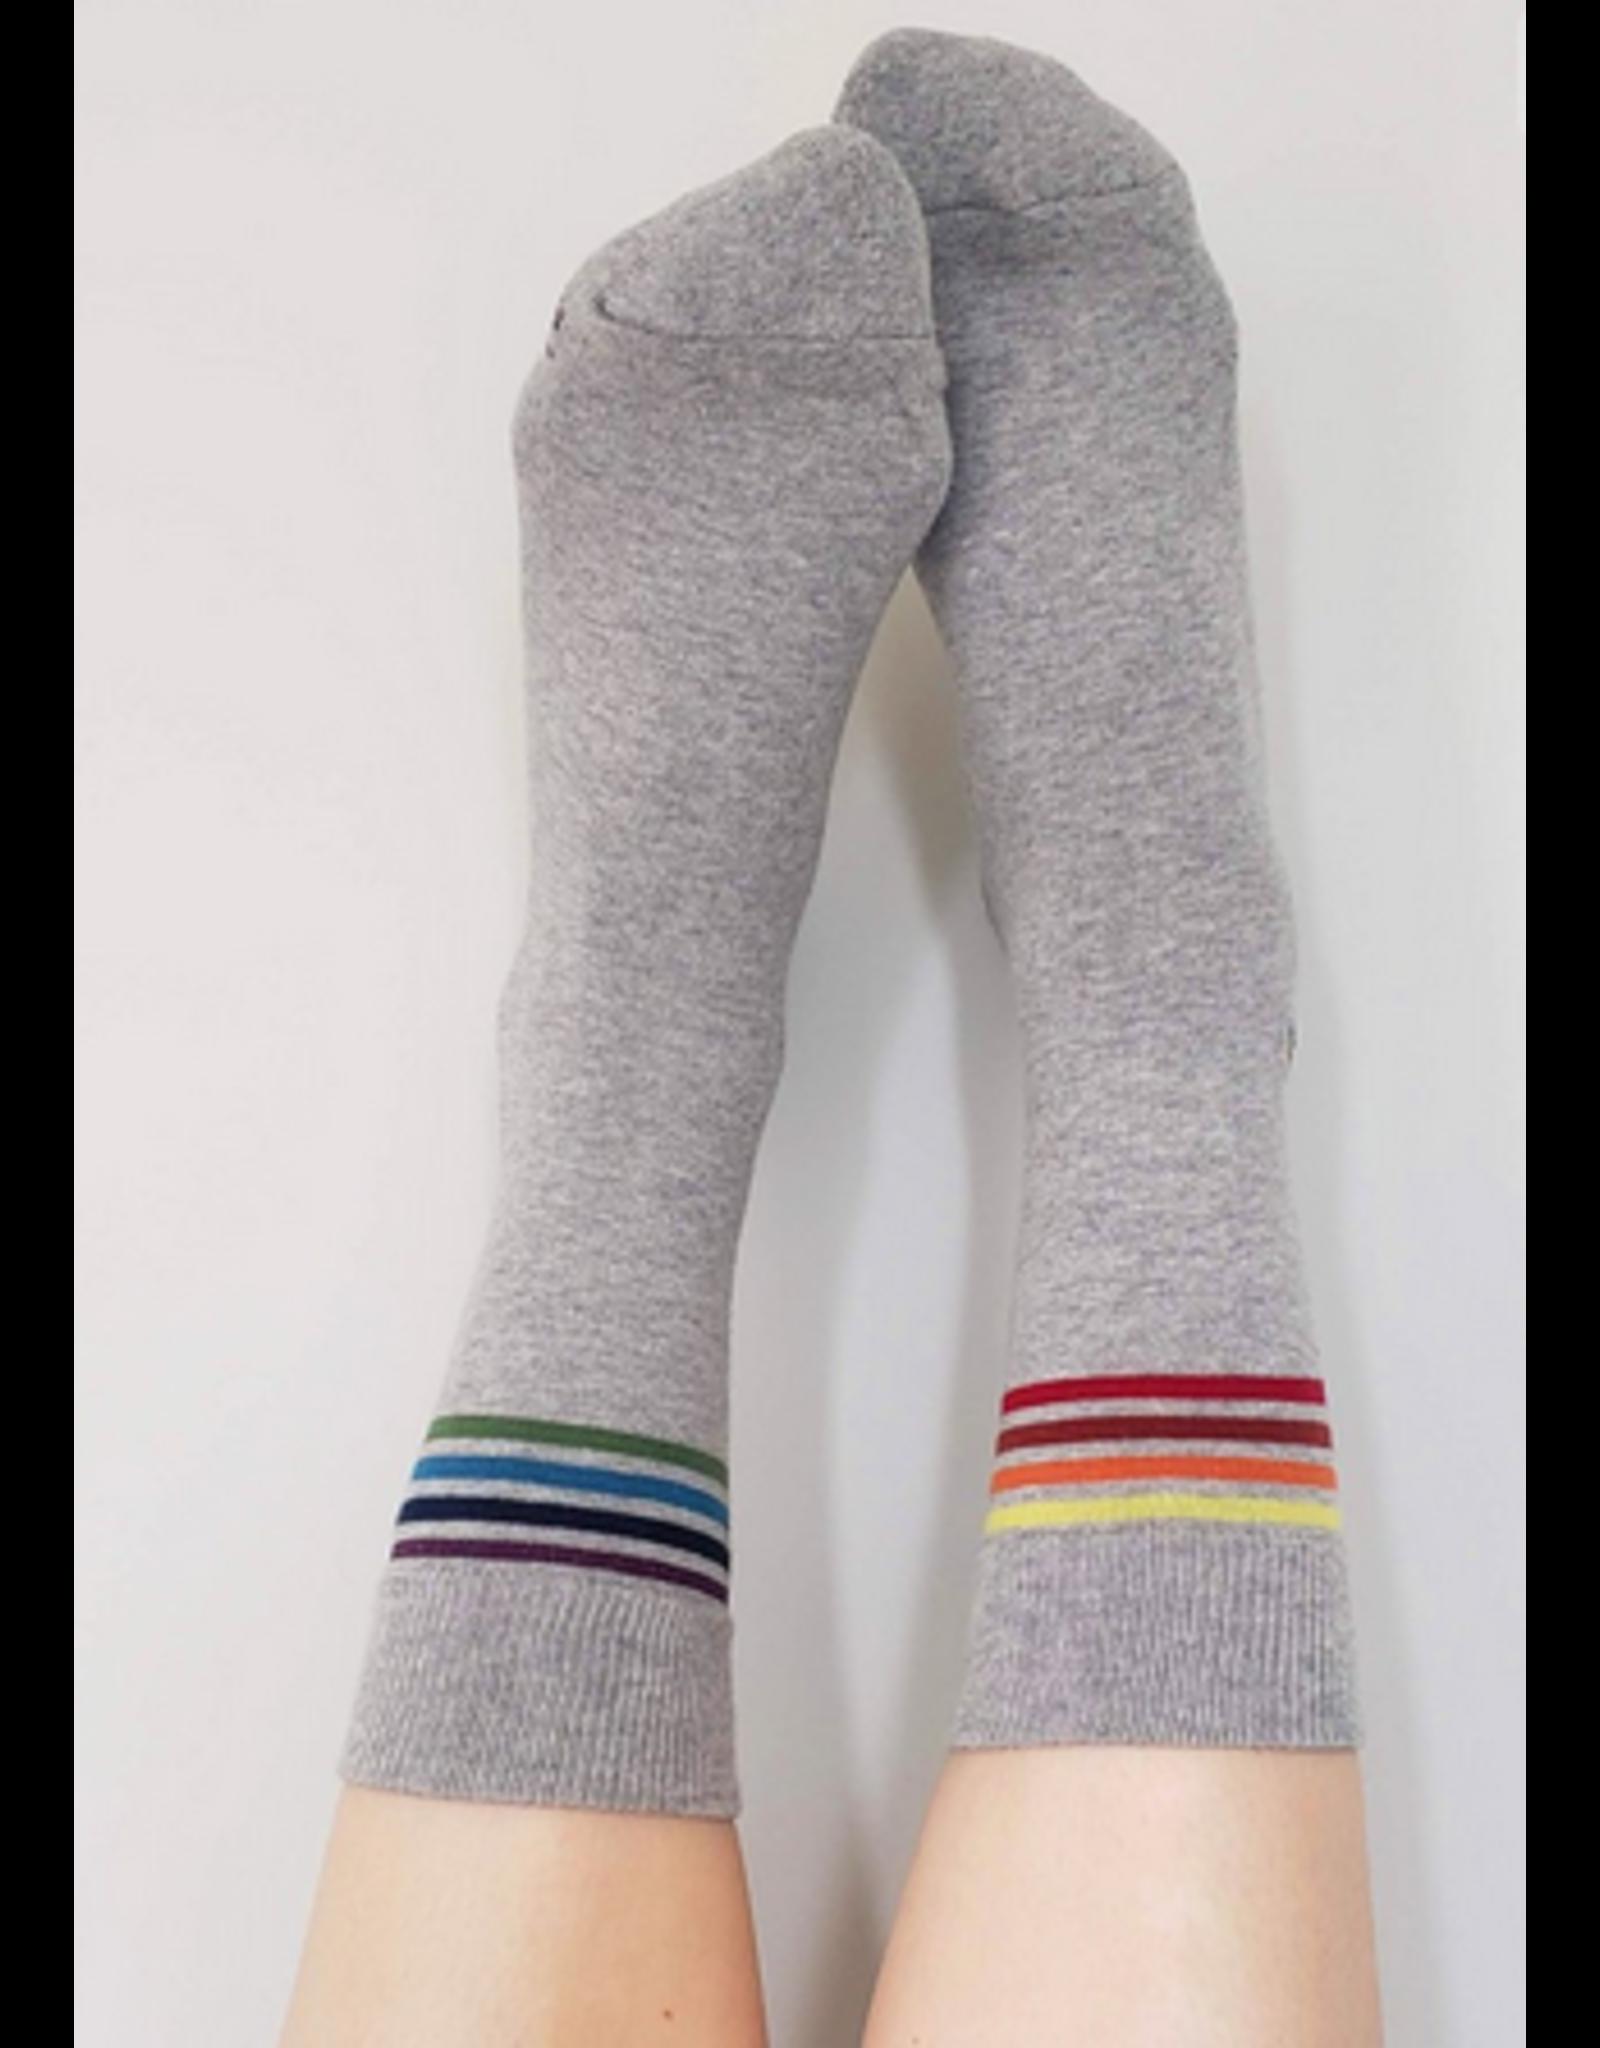 Conscious Step Socks that Save LGBTQ Lives - Small Grey